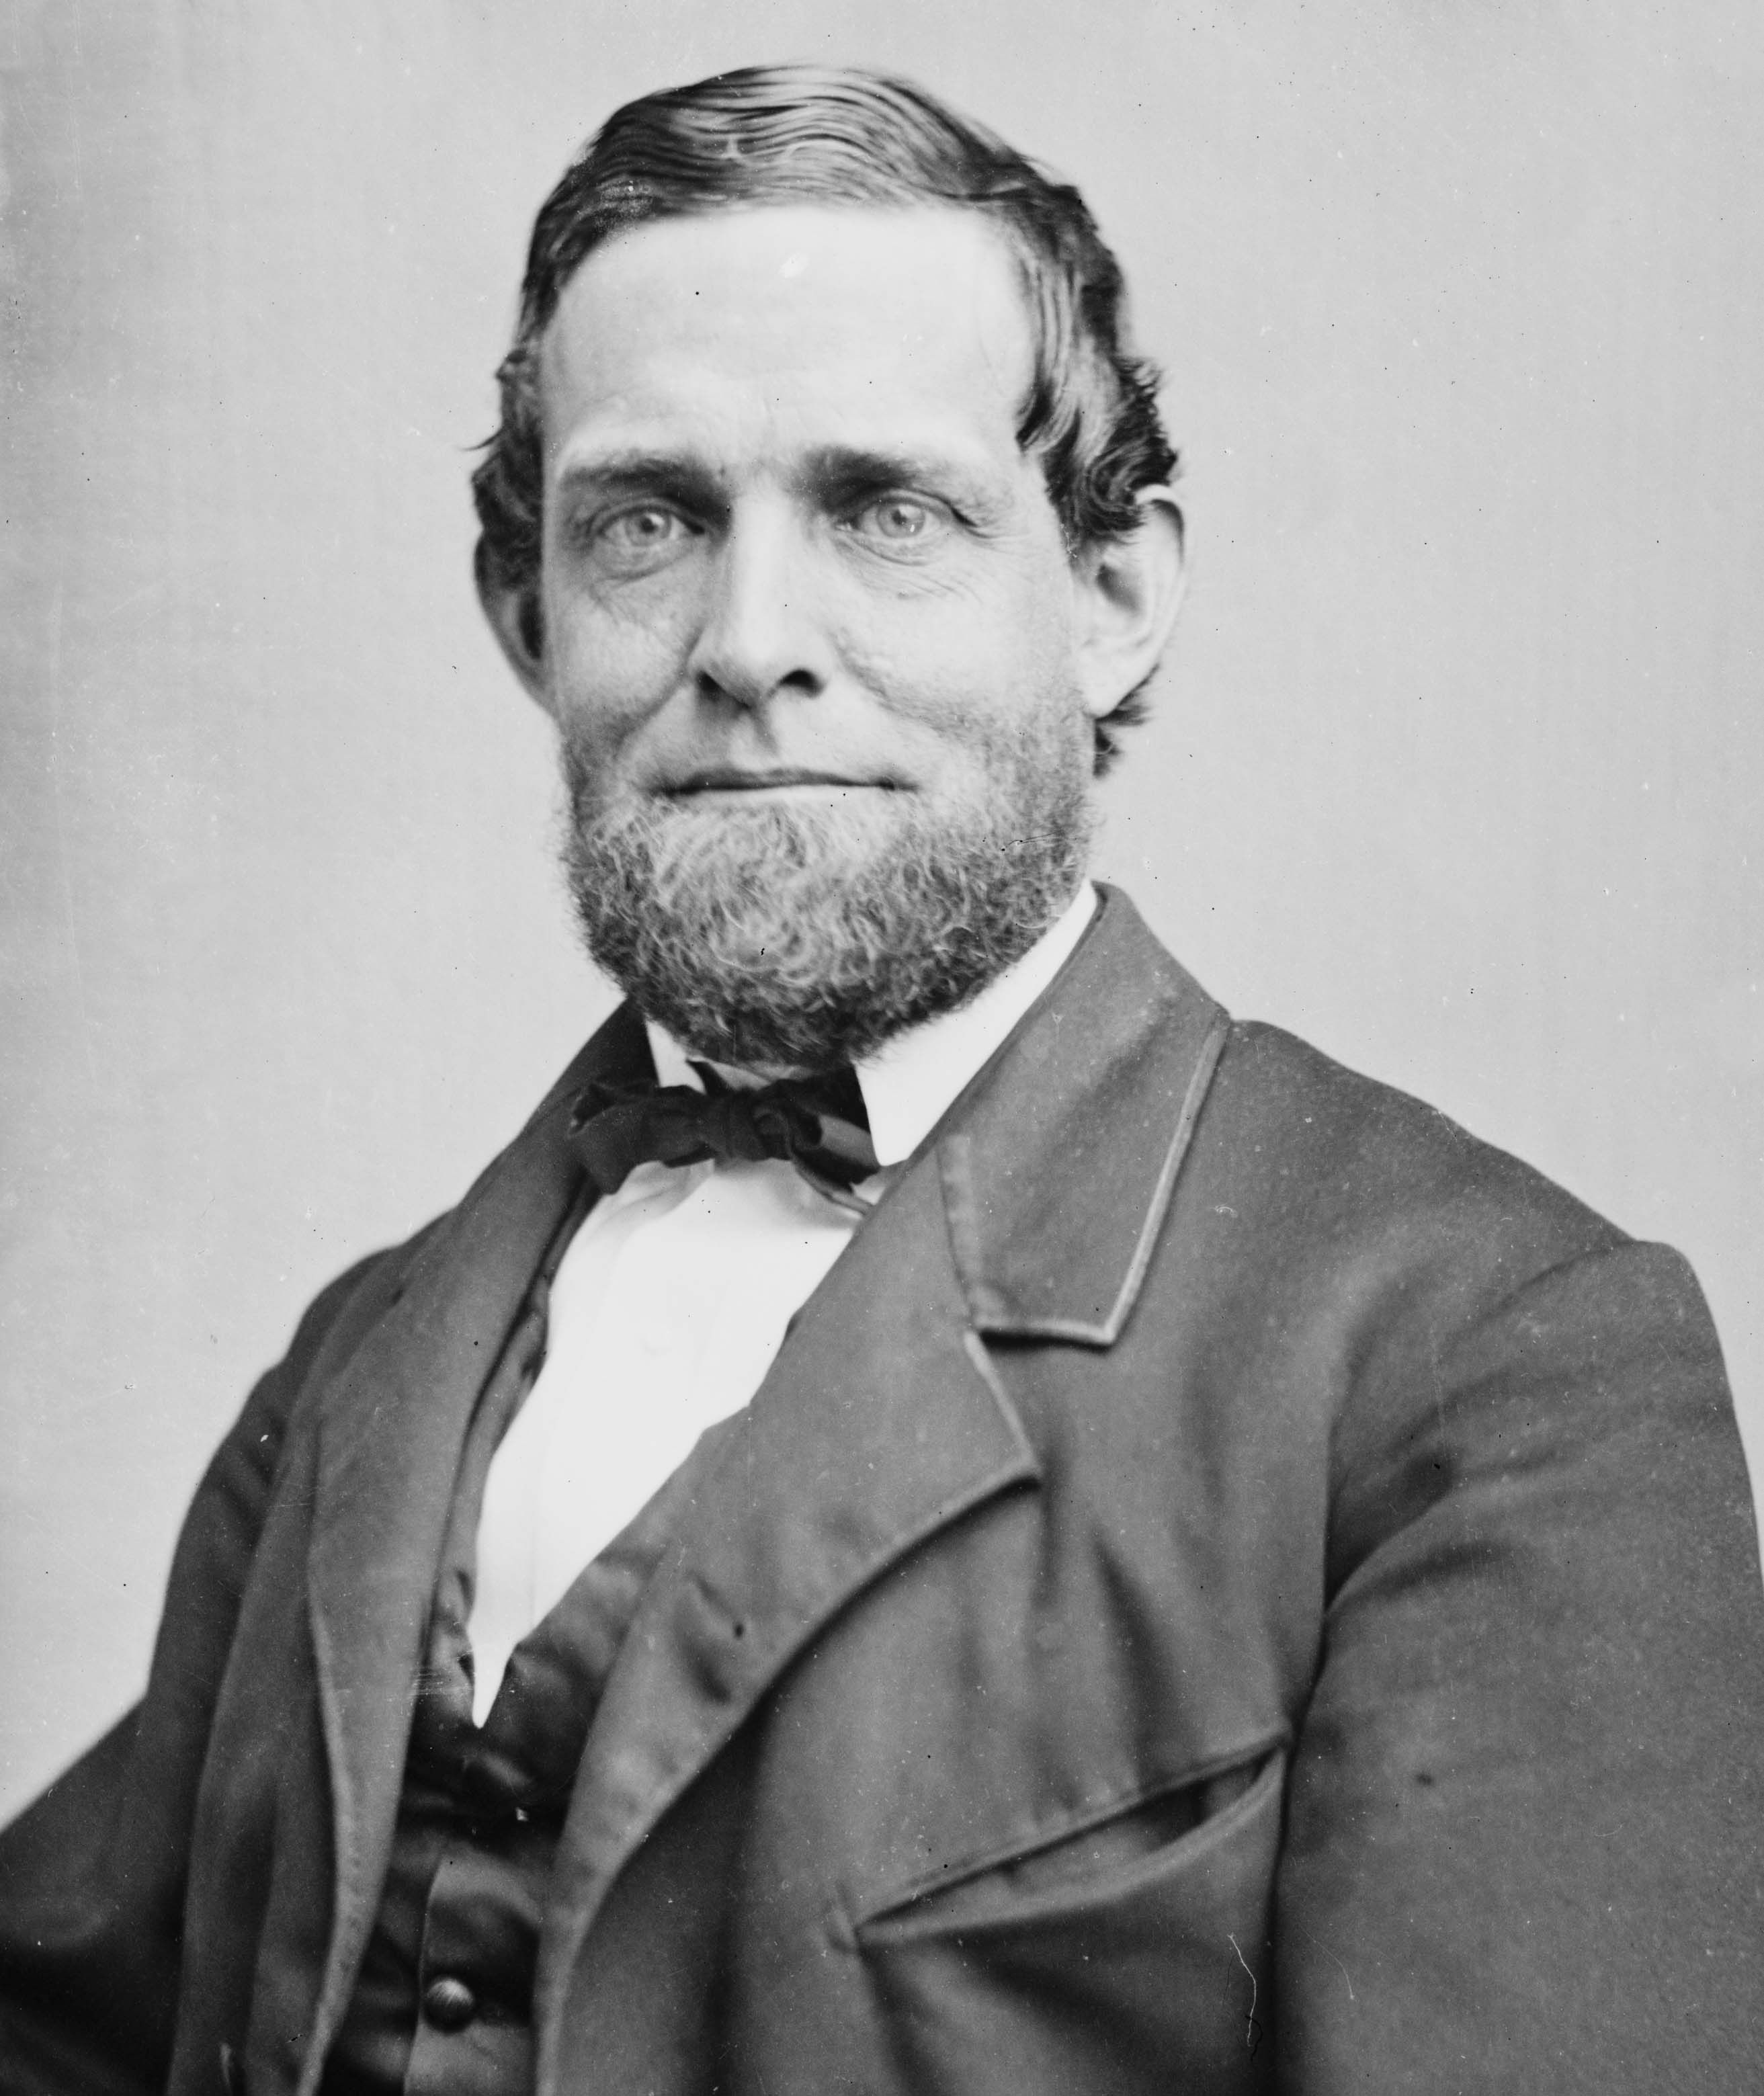 Schuyler Colfax - 1st Vice President  (1869-1873)